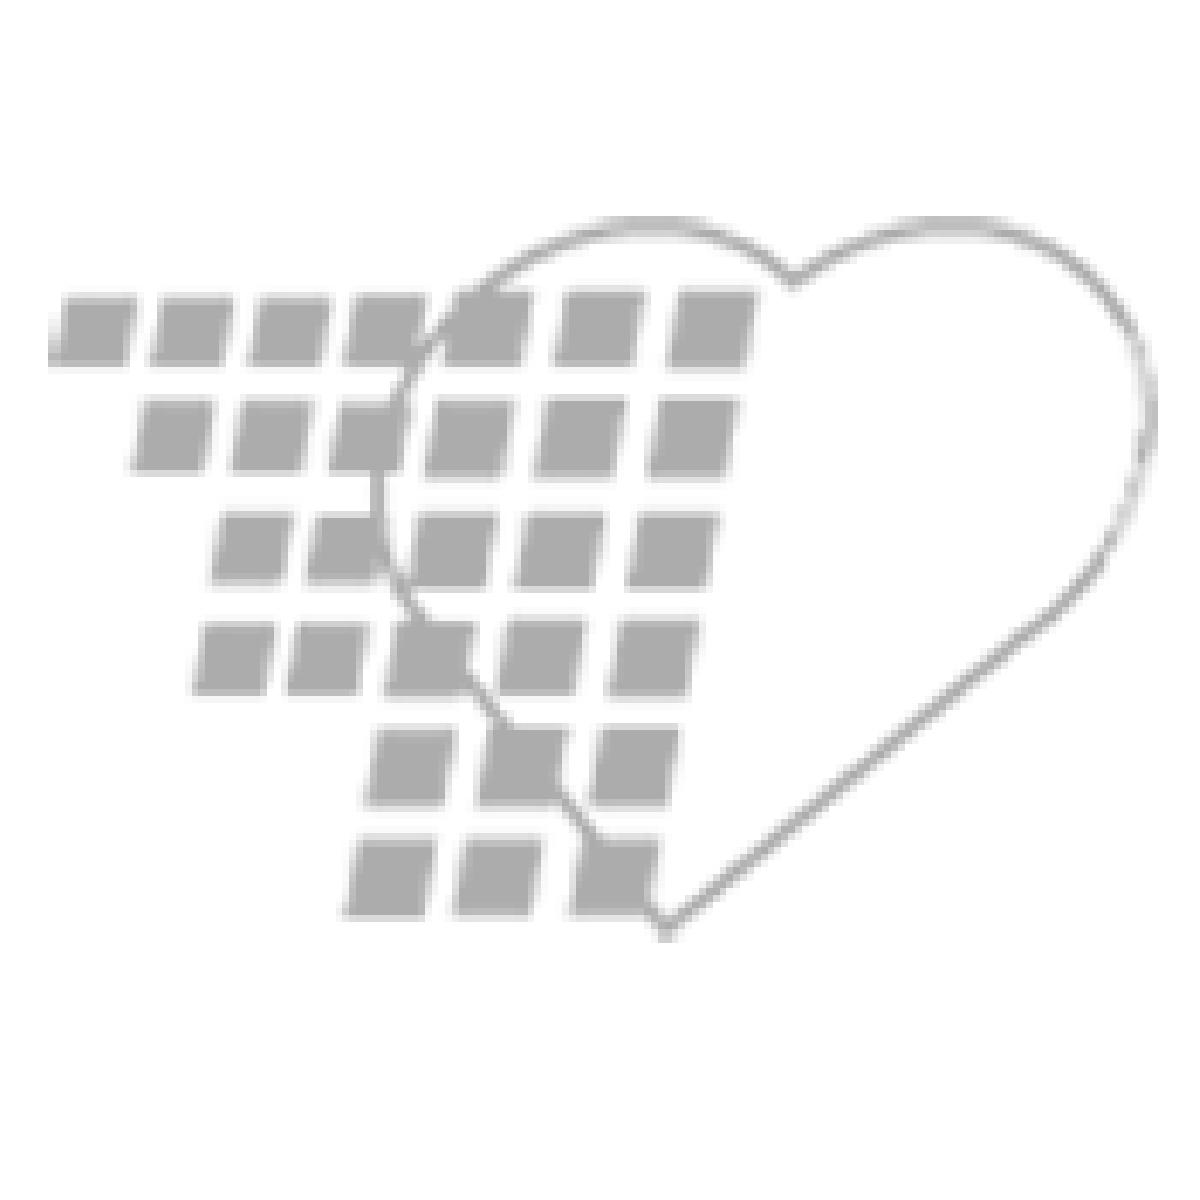 06-93-1155 Demo Dose® Dextros 50% 50mL